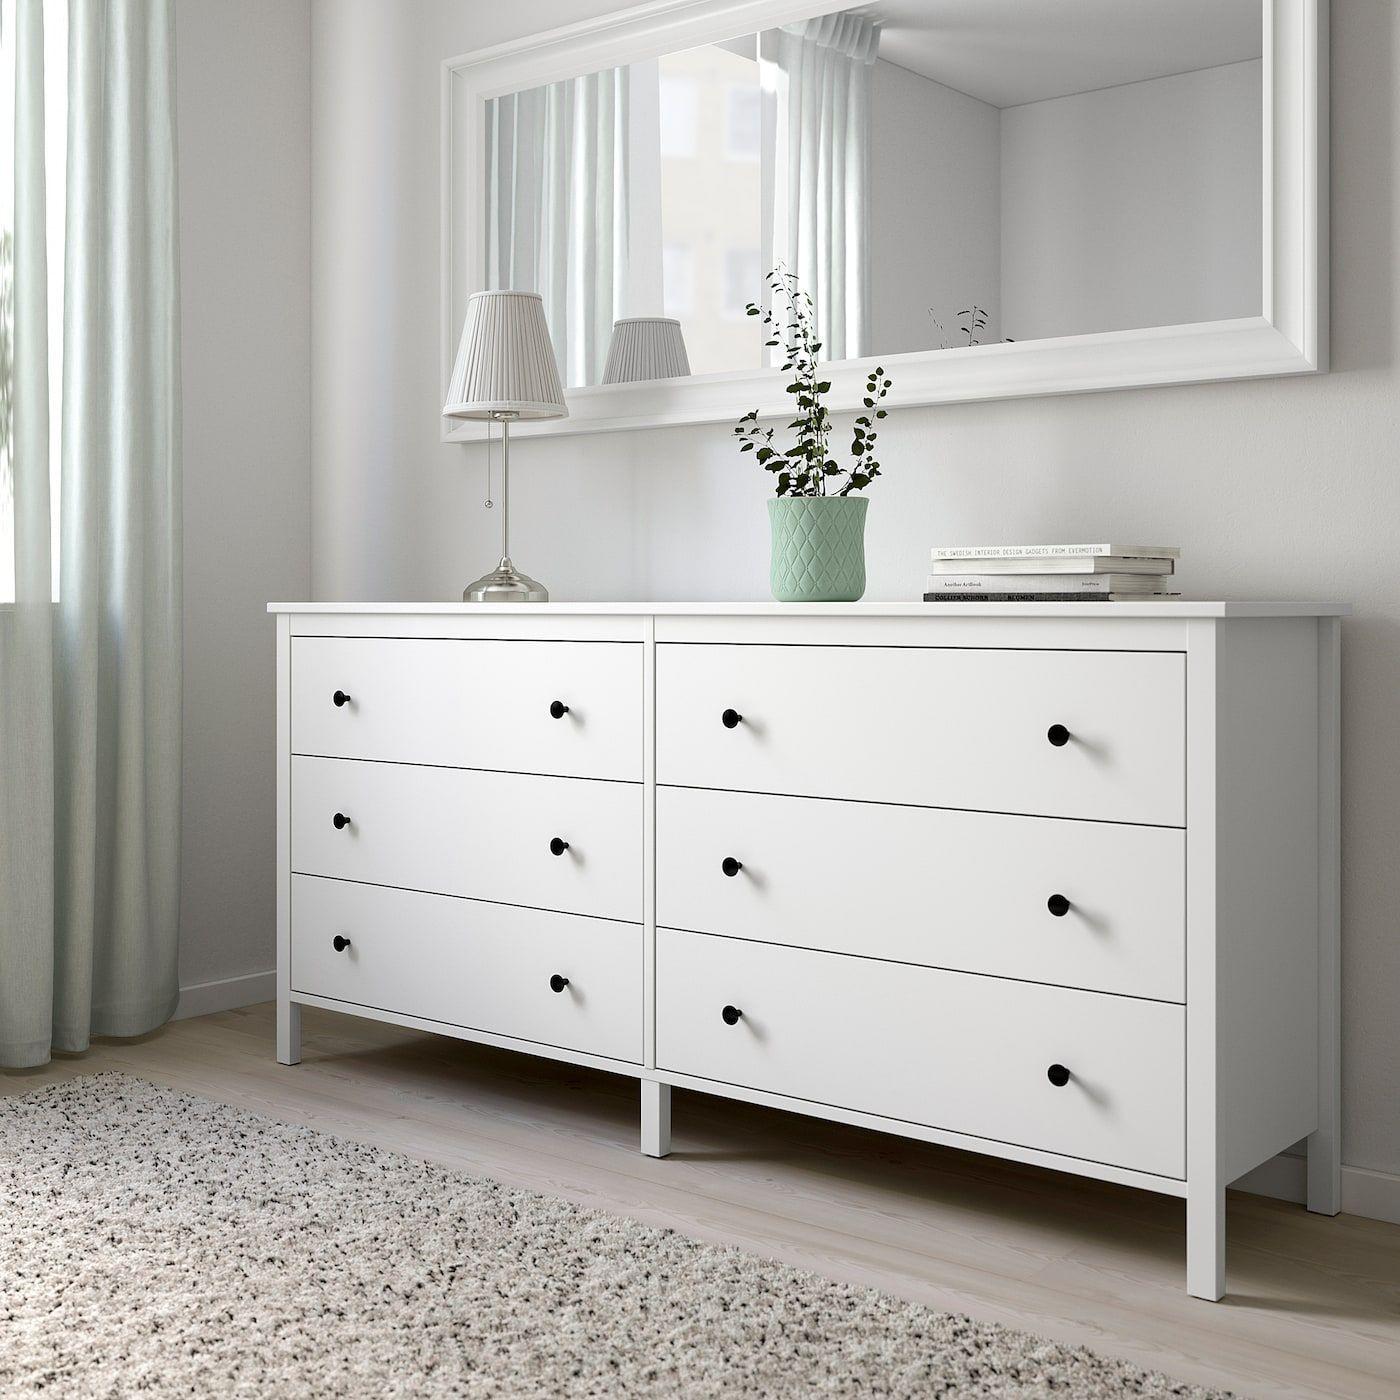 Best Koppang 6 Drawer Dresser White 67 3 4X32 5 8 172X83 400 x 300